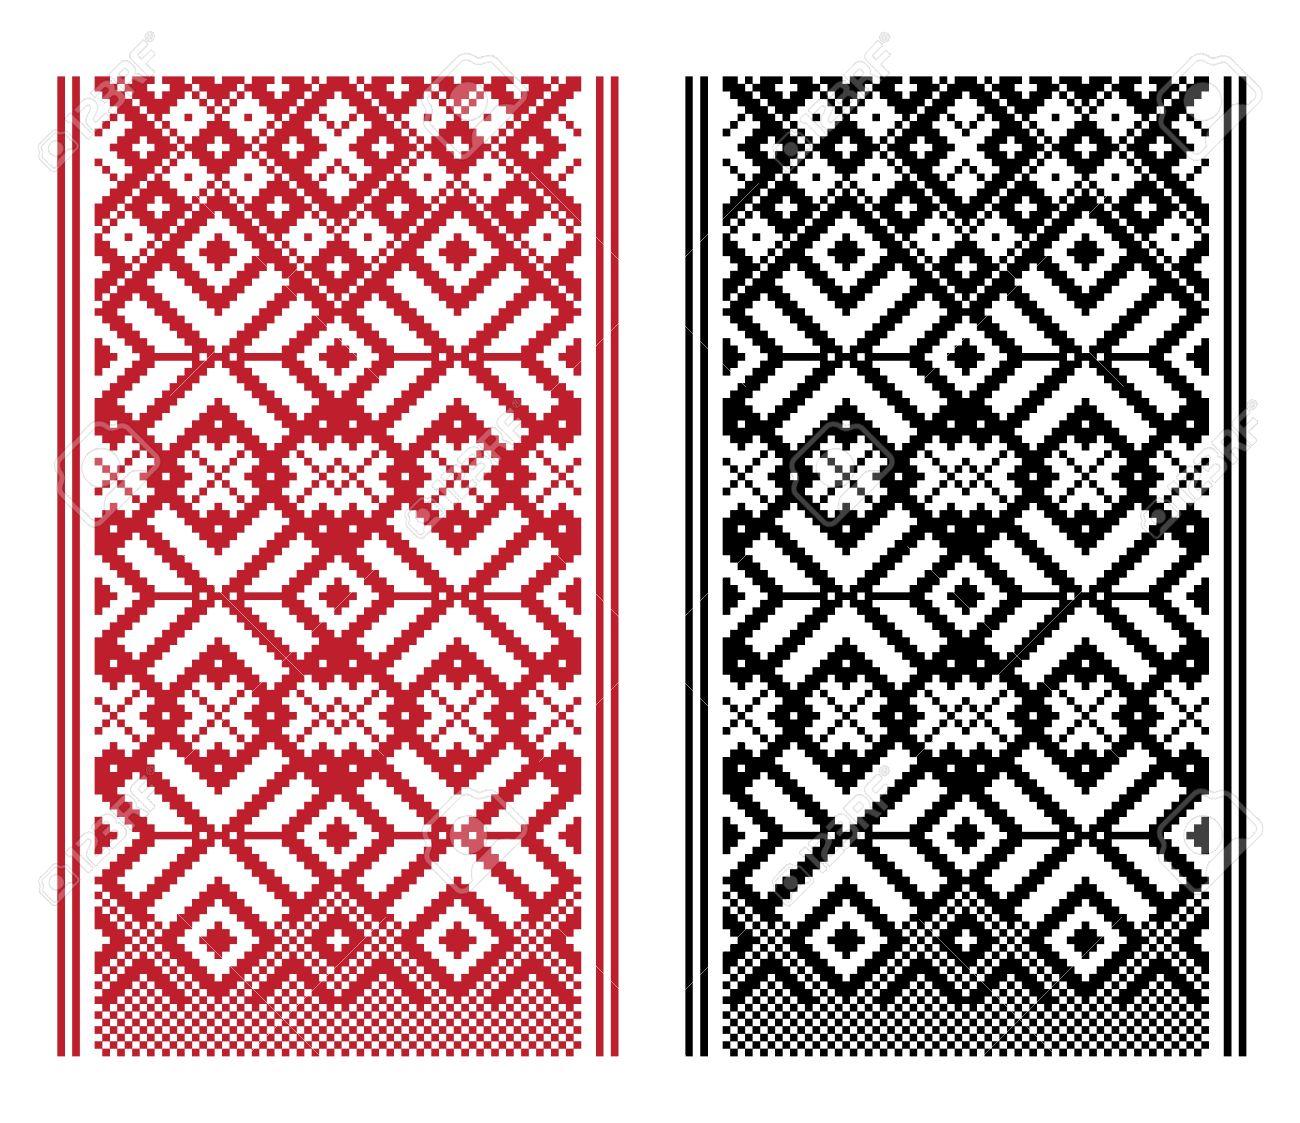 Geometrical knitting pattern, woven belt pattern - 20654348